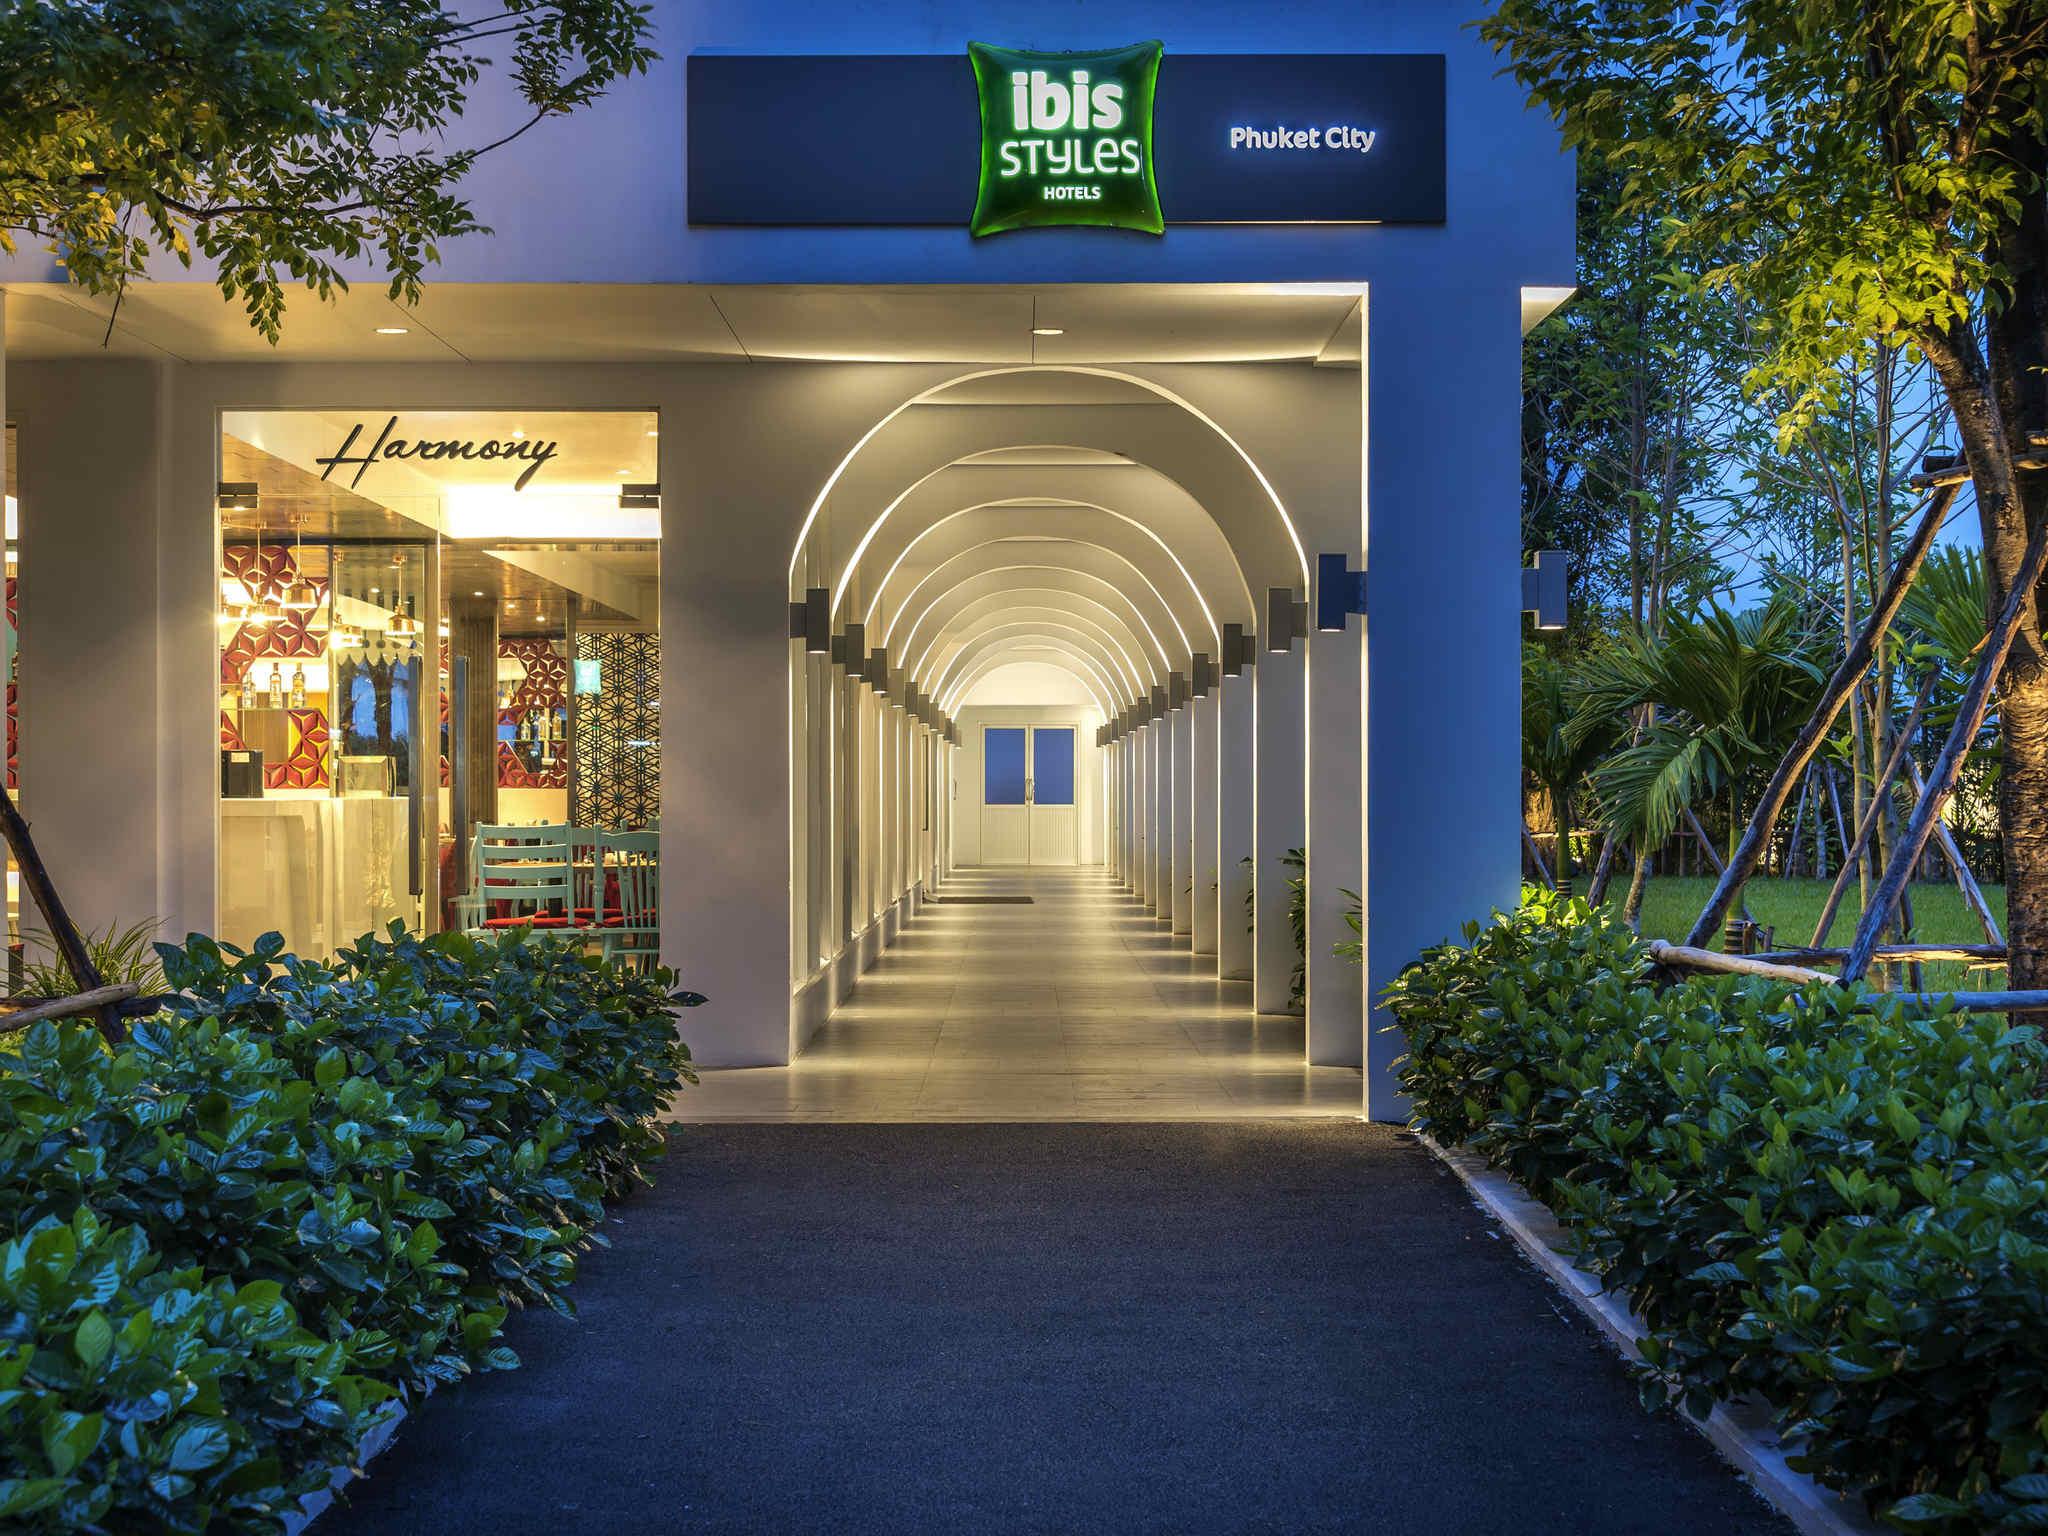 Hotel - ibis Styles Phuket City